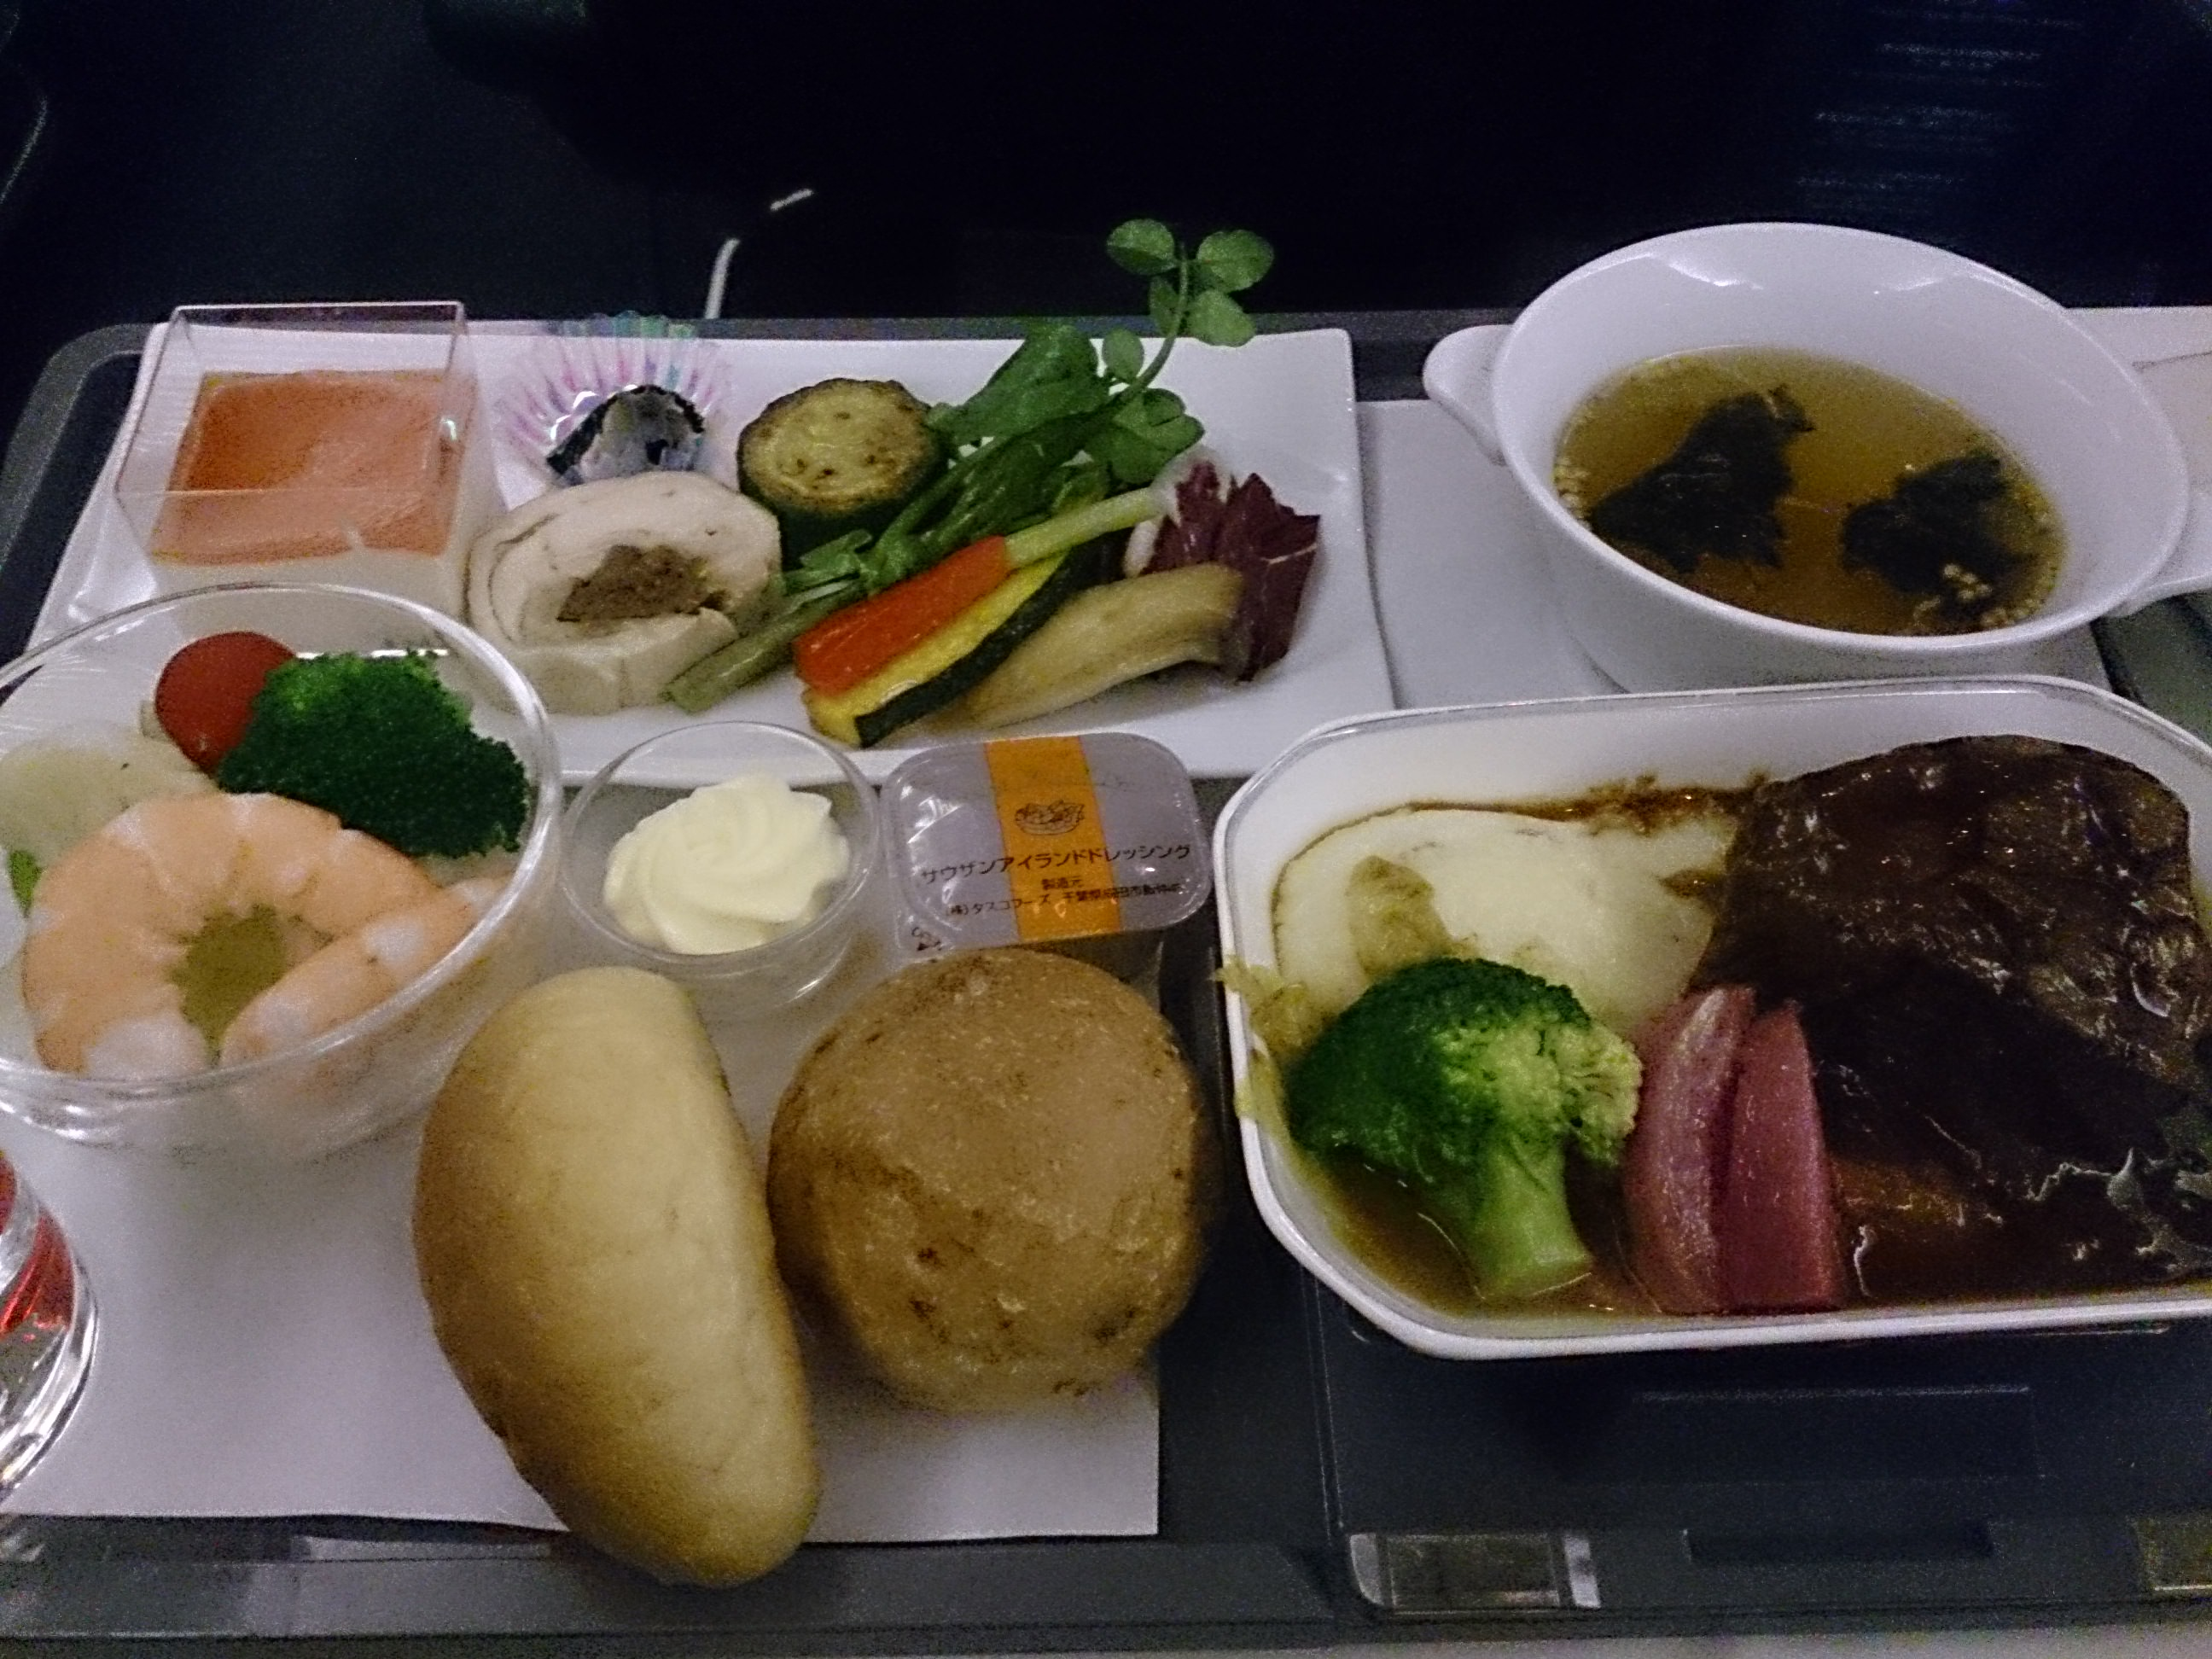 767-300ER JAL735 スカイラックスで行く香港